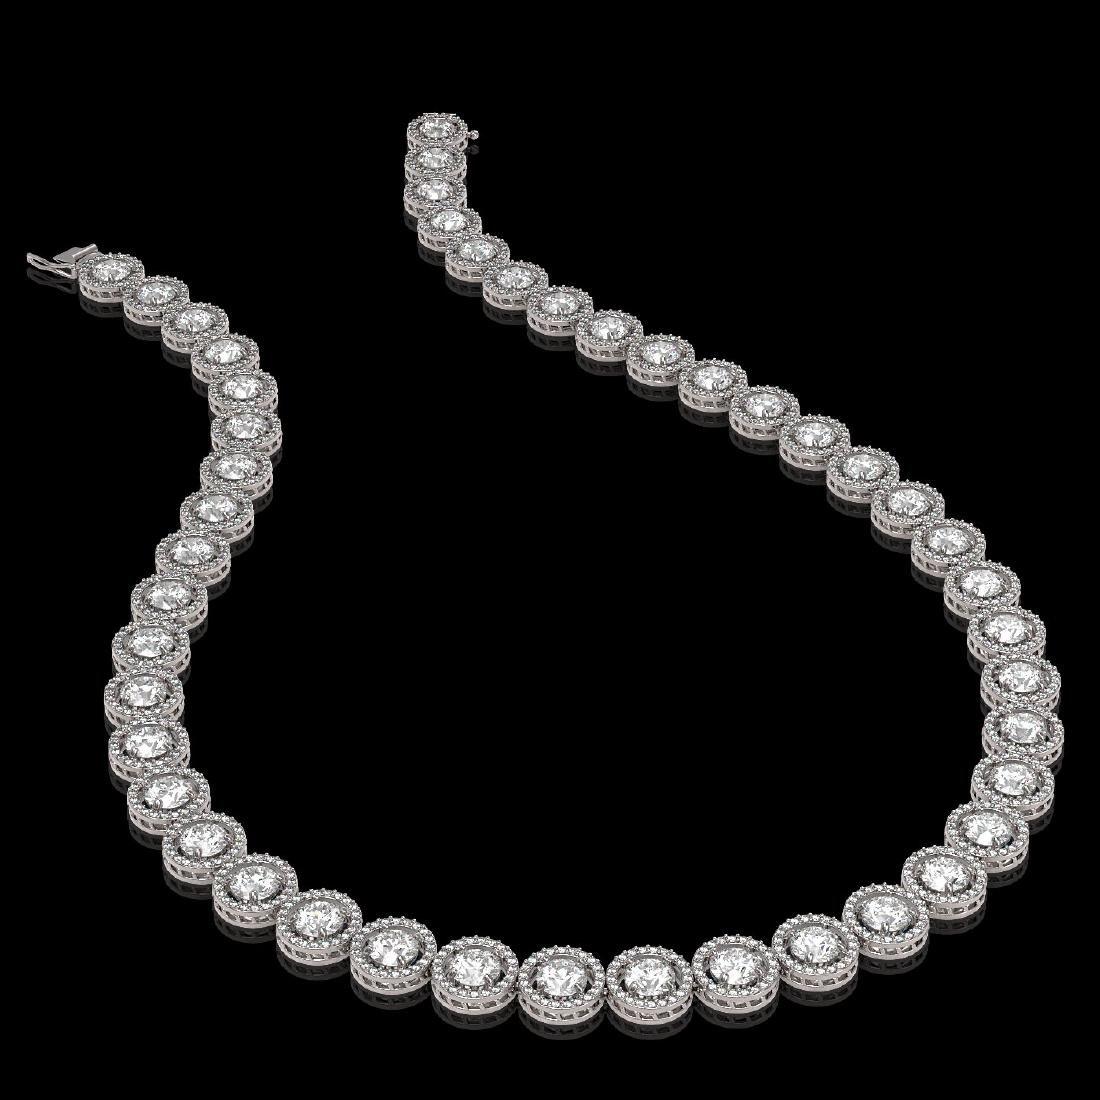 30.78 CTW Diamond Designer Necklace 18K White Gold - 2